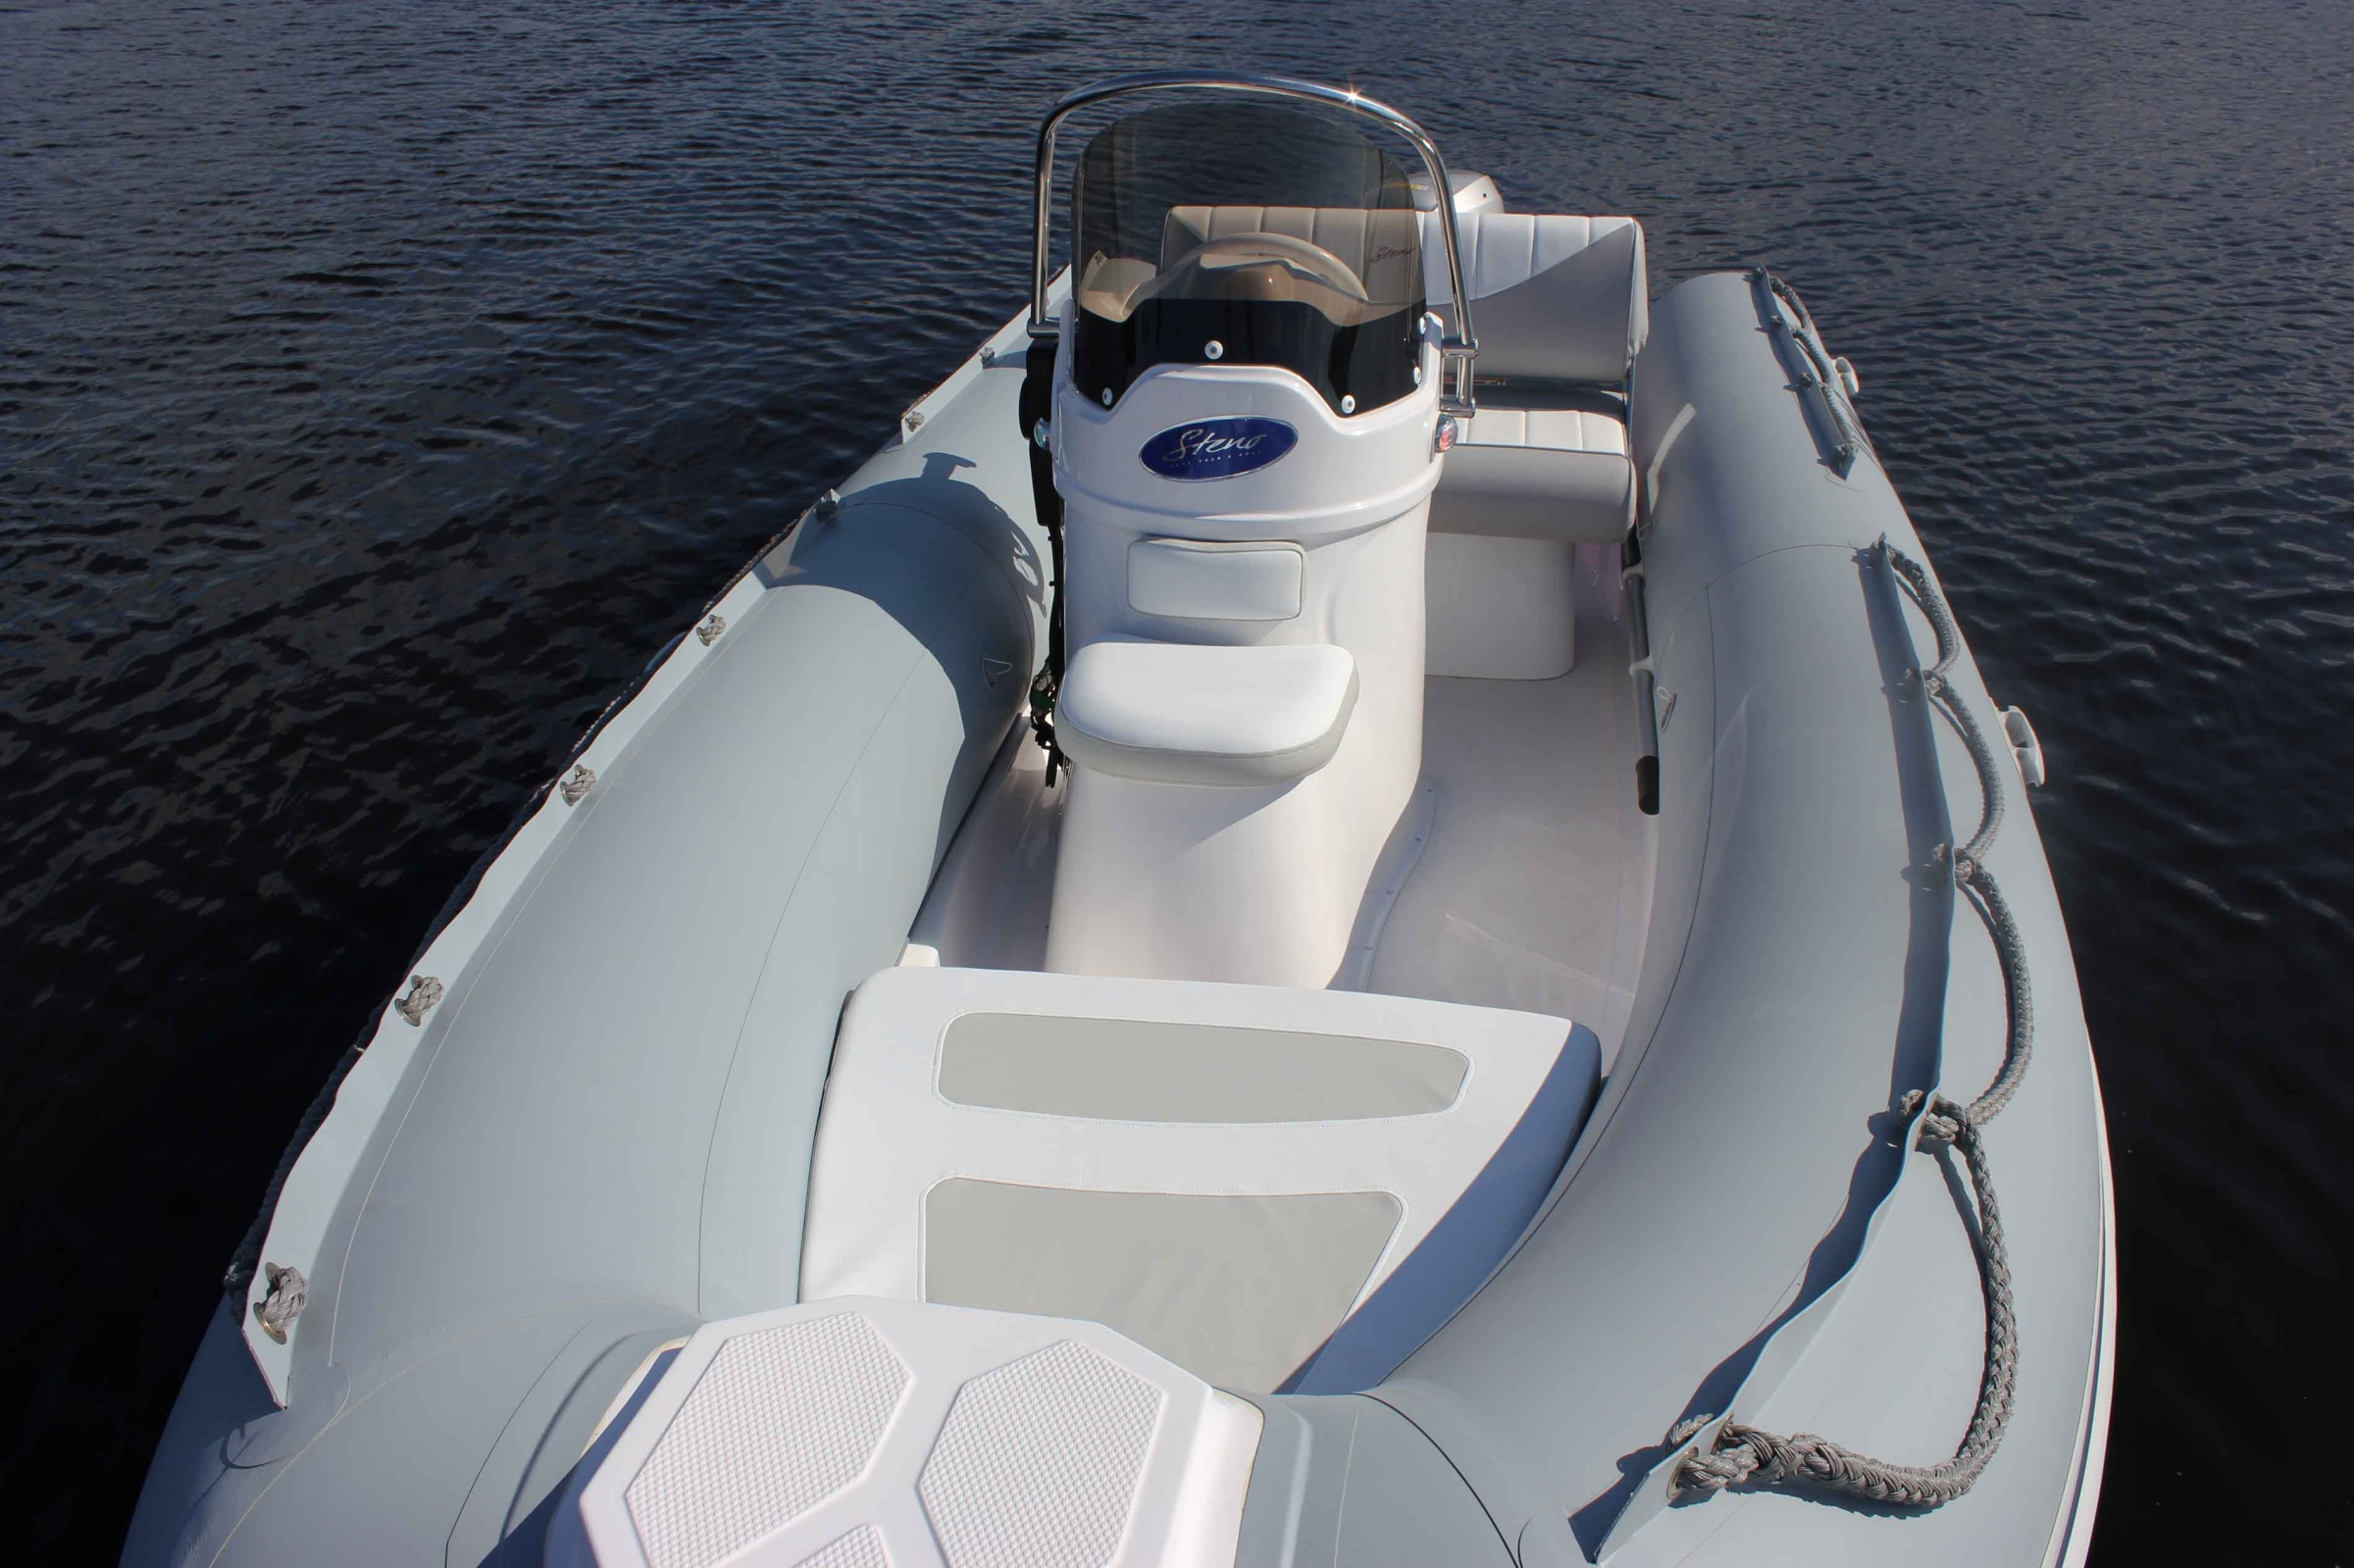 Скоростная универсальная лодка Steno RIB 500